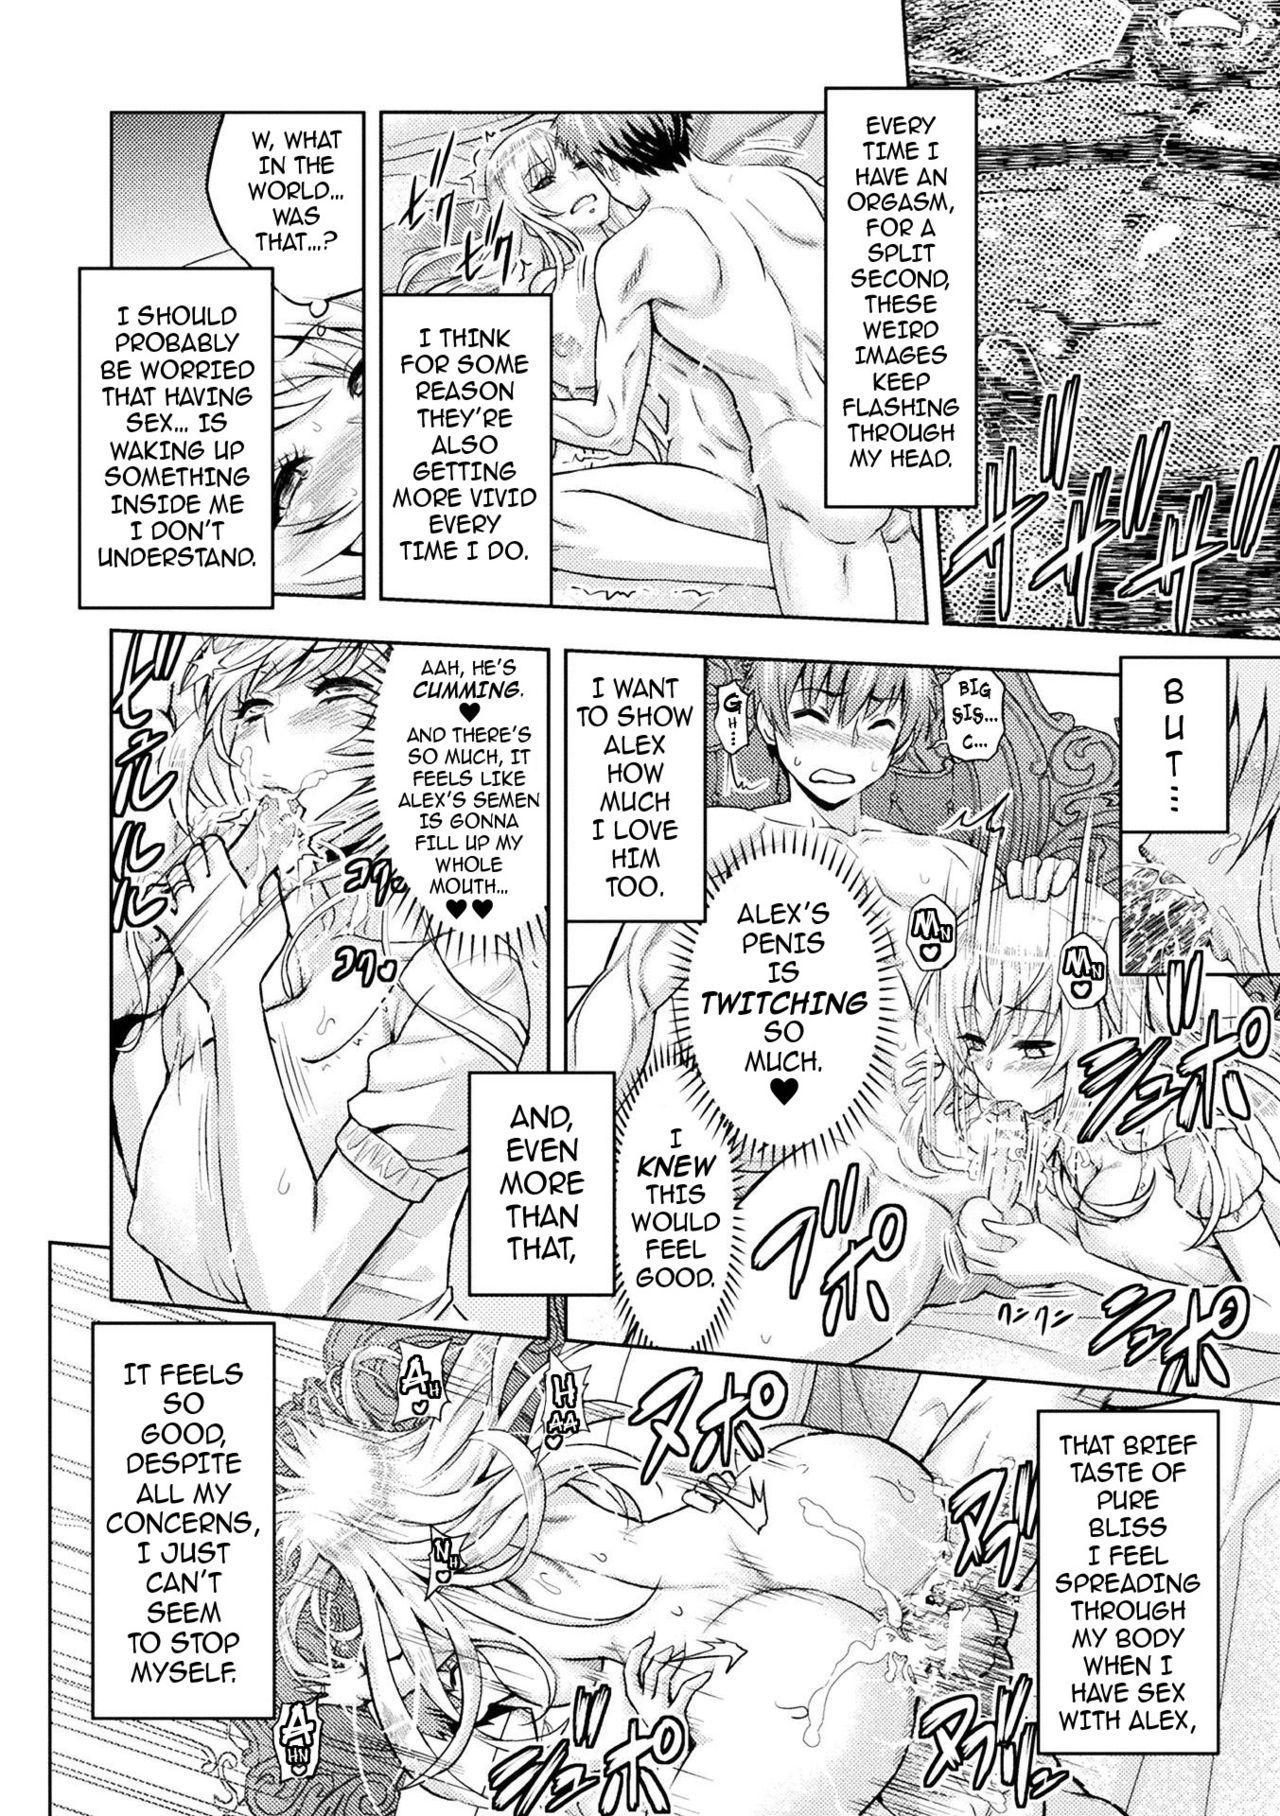 [Yamada Gogogo] Erona ~Orc no Inmon ni Okasareta Onna Kishi no Matsuro~ | Erona ~The Fall of a Beautiful Knight Cursed with the Lewd Mark of an Orc~ [English] {darknight} 142